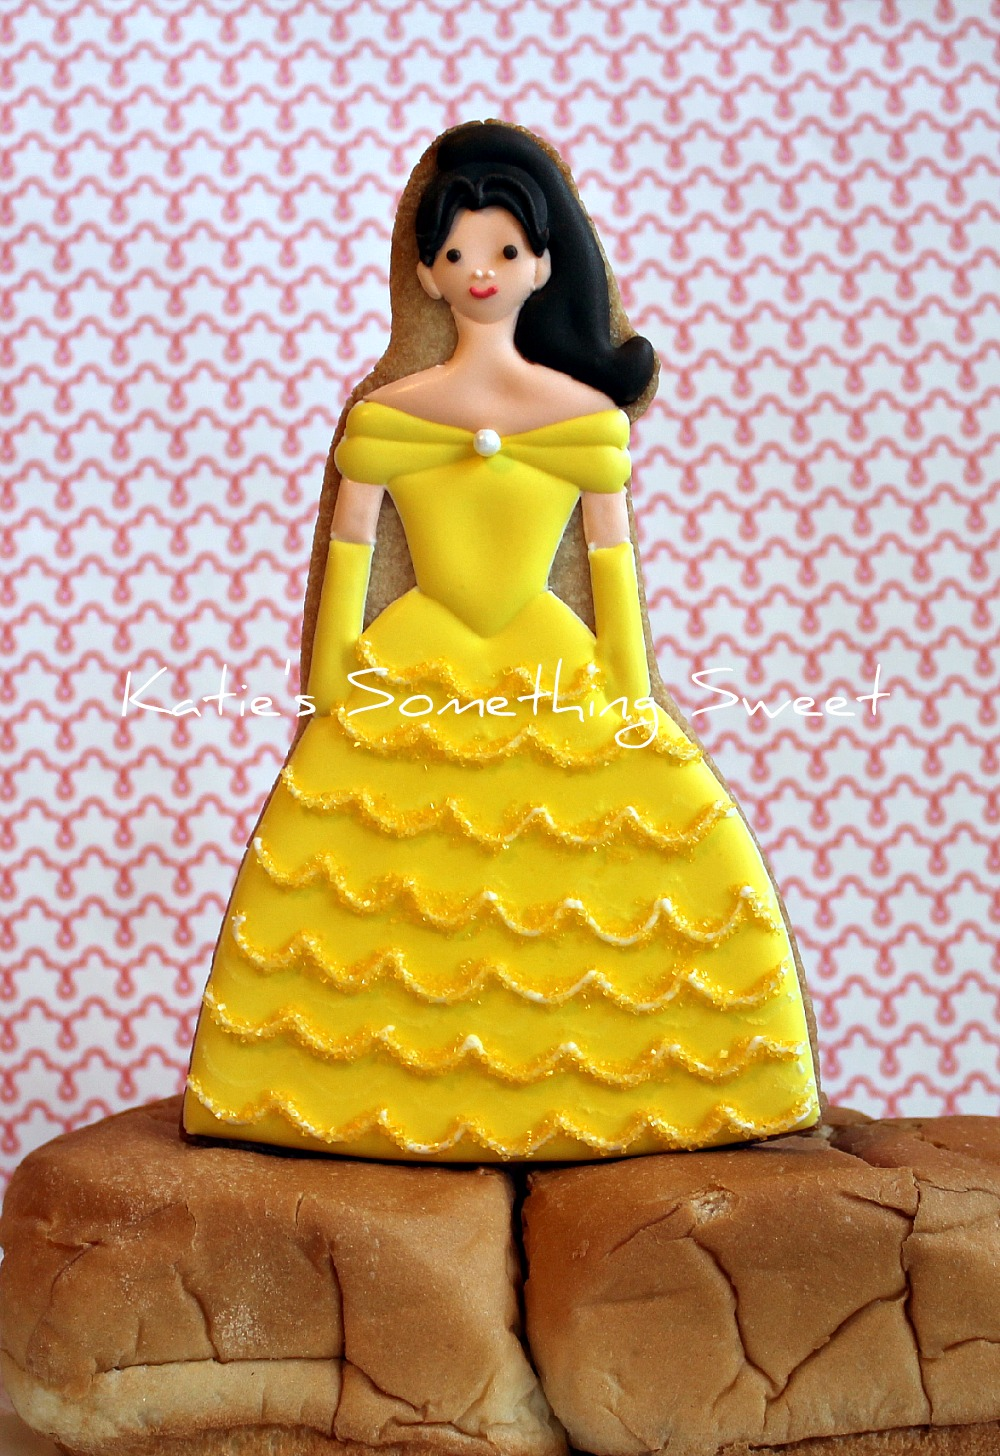 Katie\'s Something Sweet}: Princess Belle Cake Topper Cookie - Beach ...